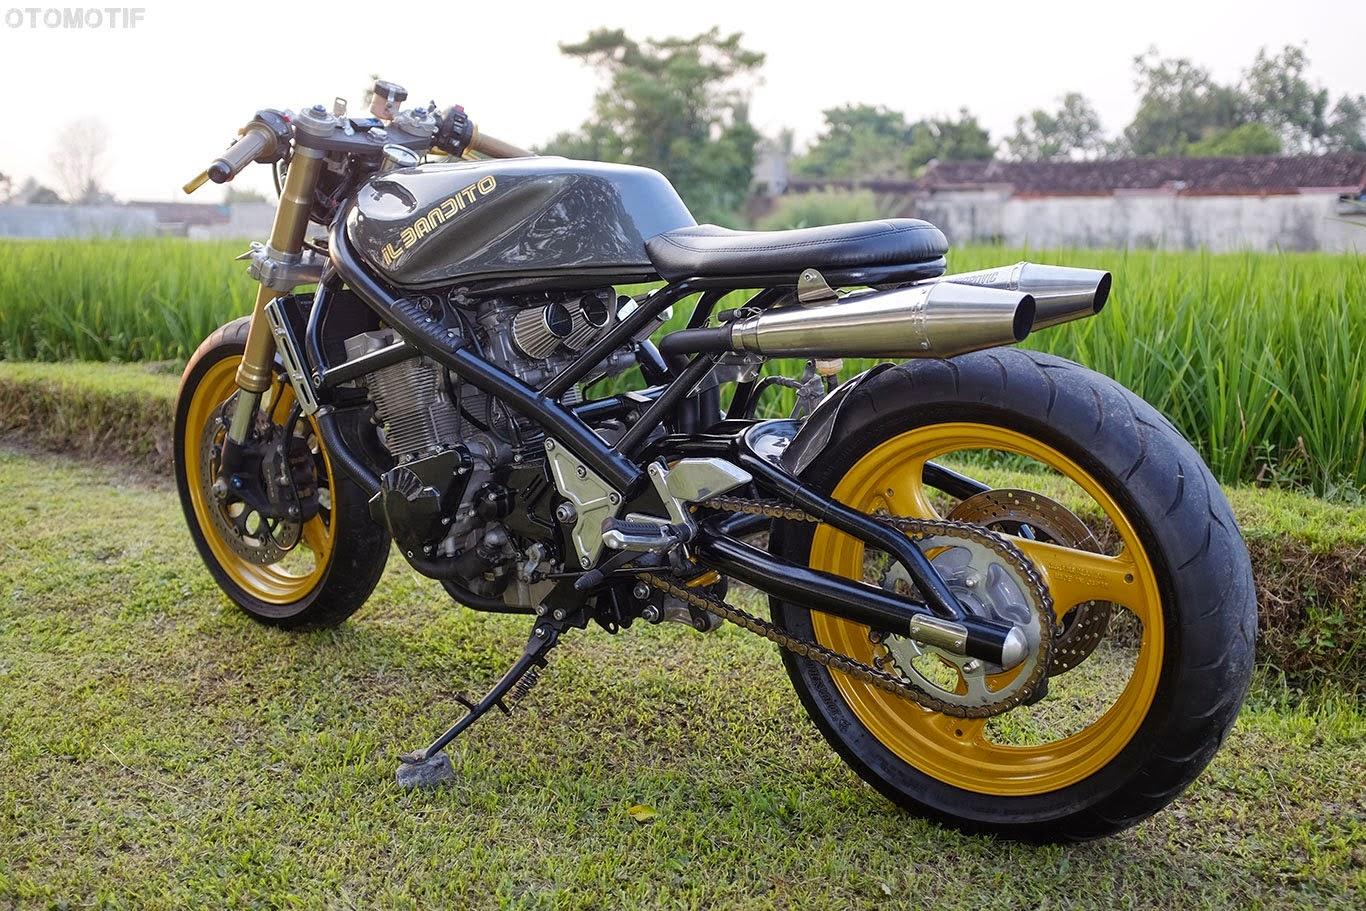 99garage | Cafe Racers Customs Passion Inspiration: Suzuki Bandit GSF 1200 Tribute GS1000R